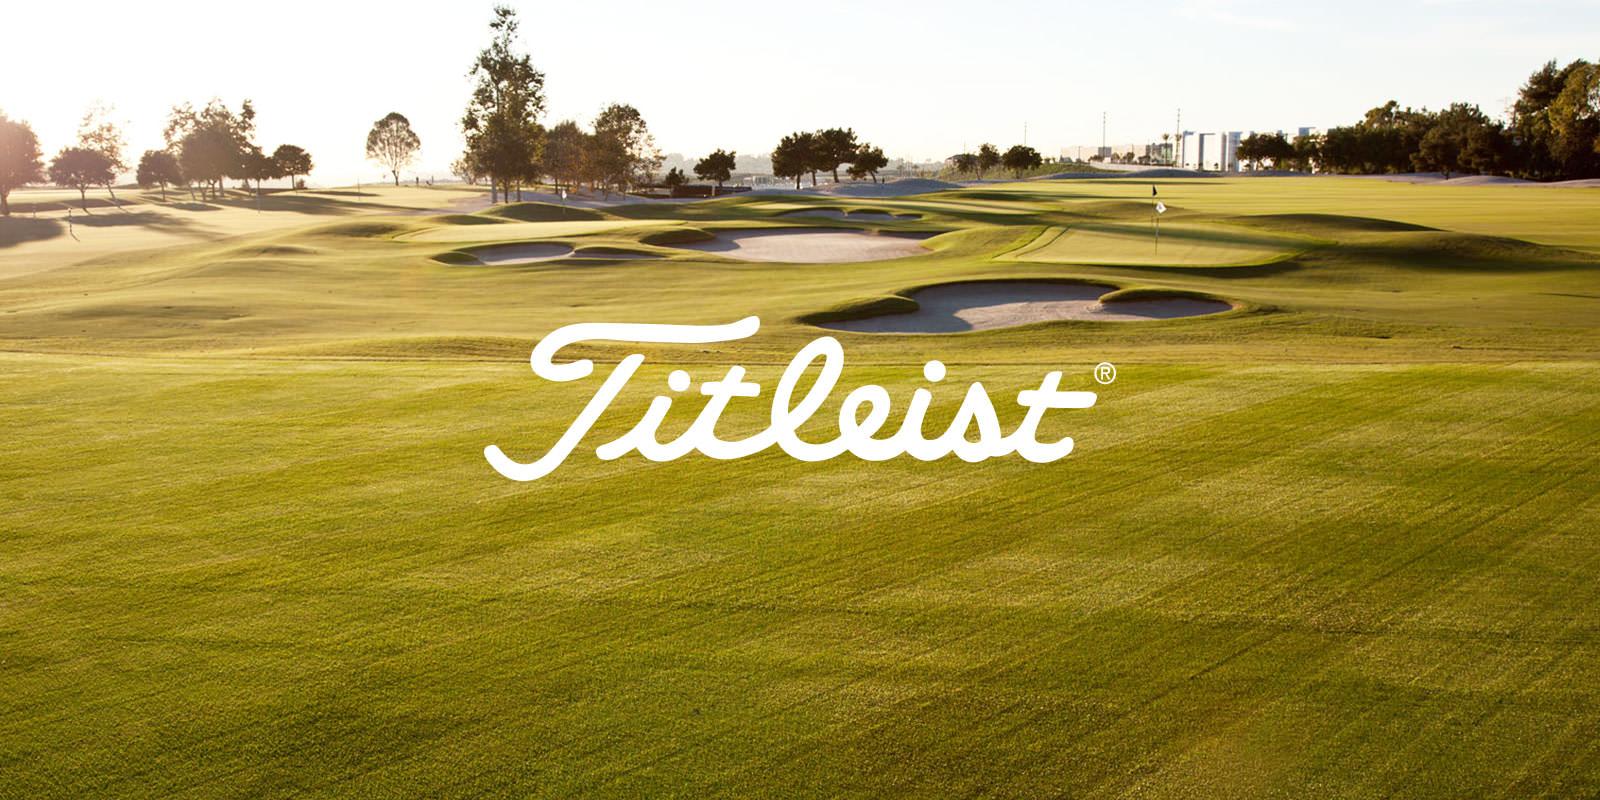 Titleist Golf Wallpaper - WallpaperSafari Golfwrx